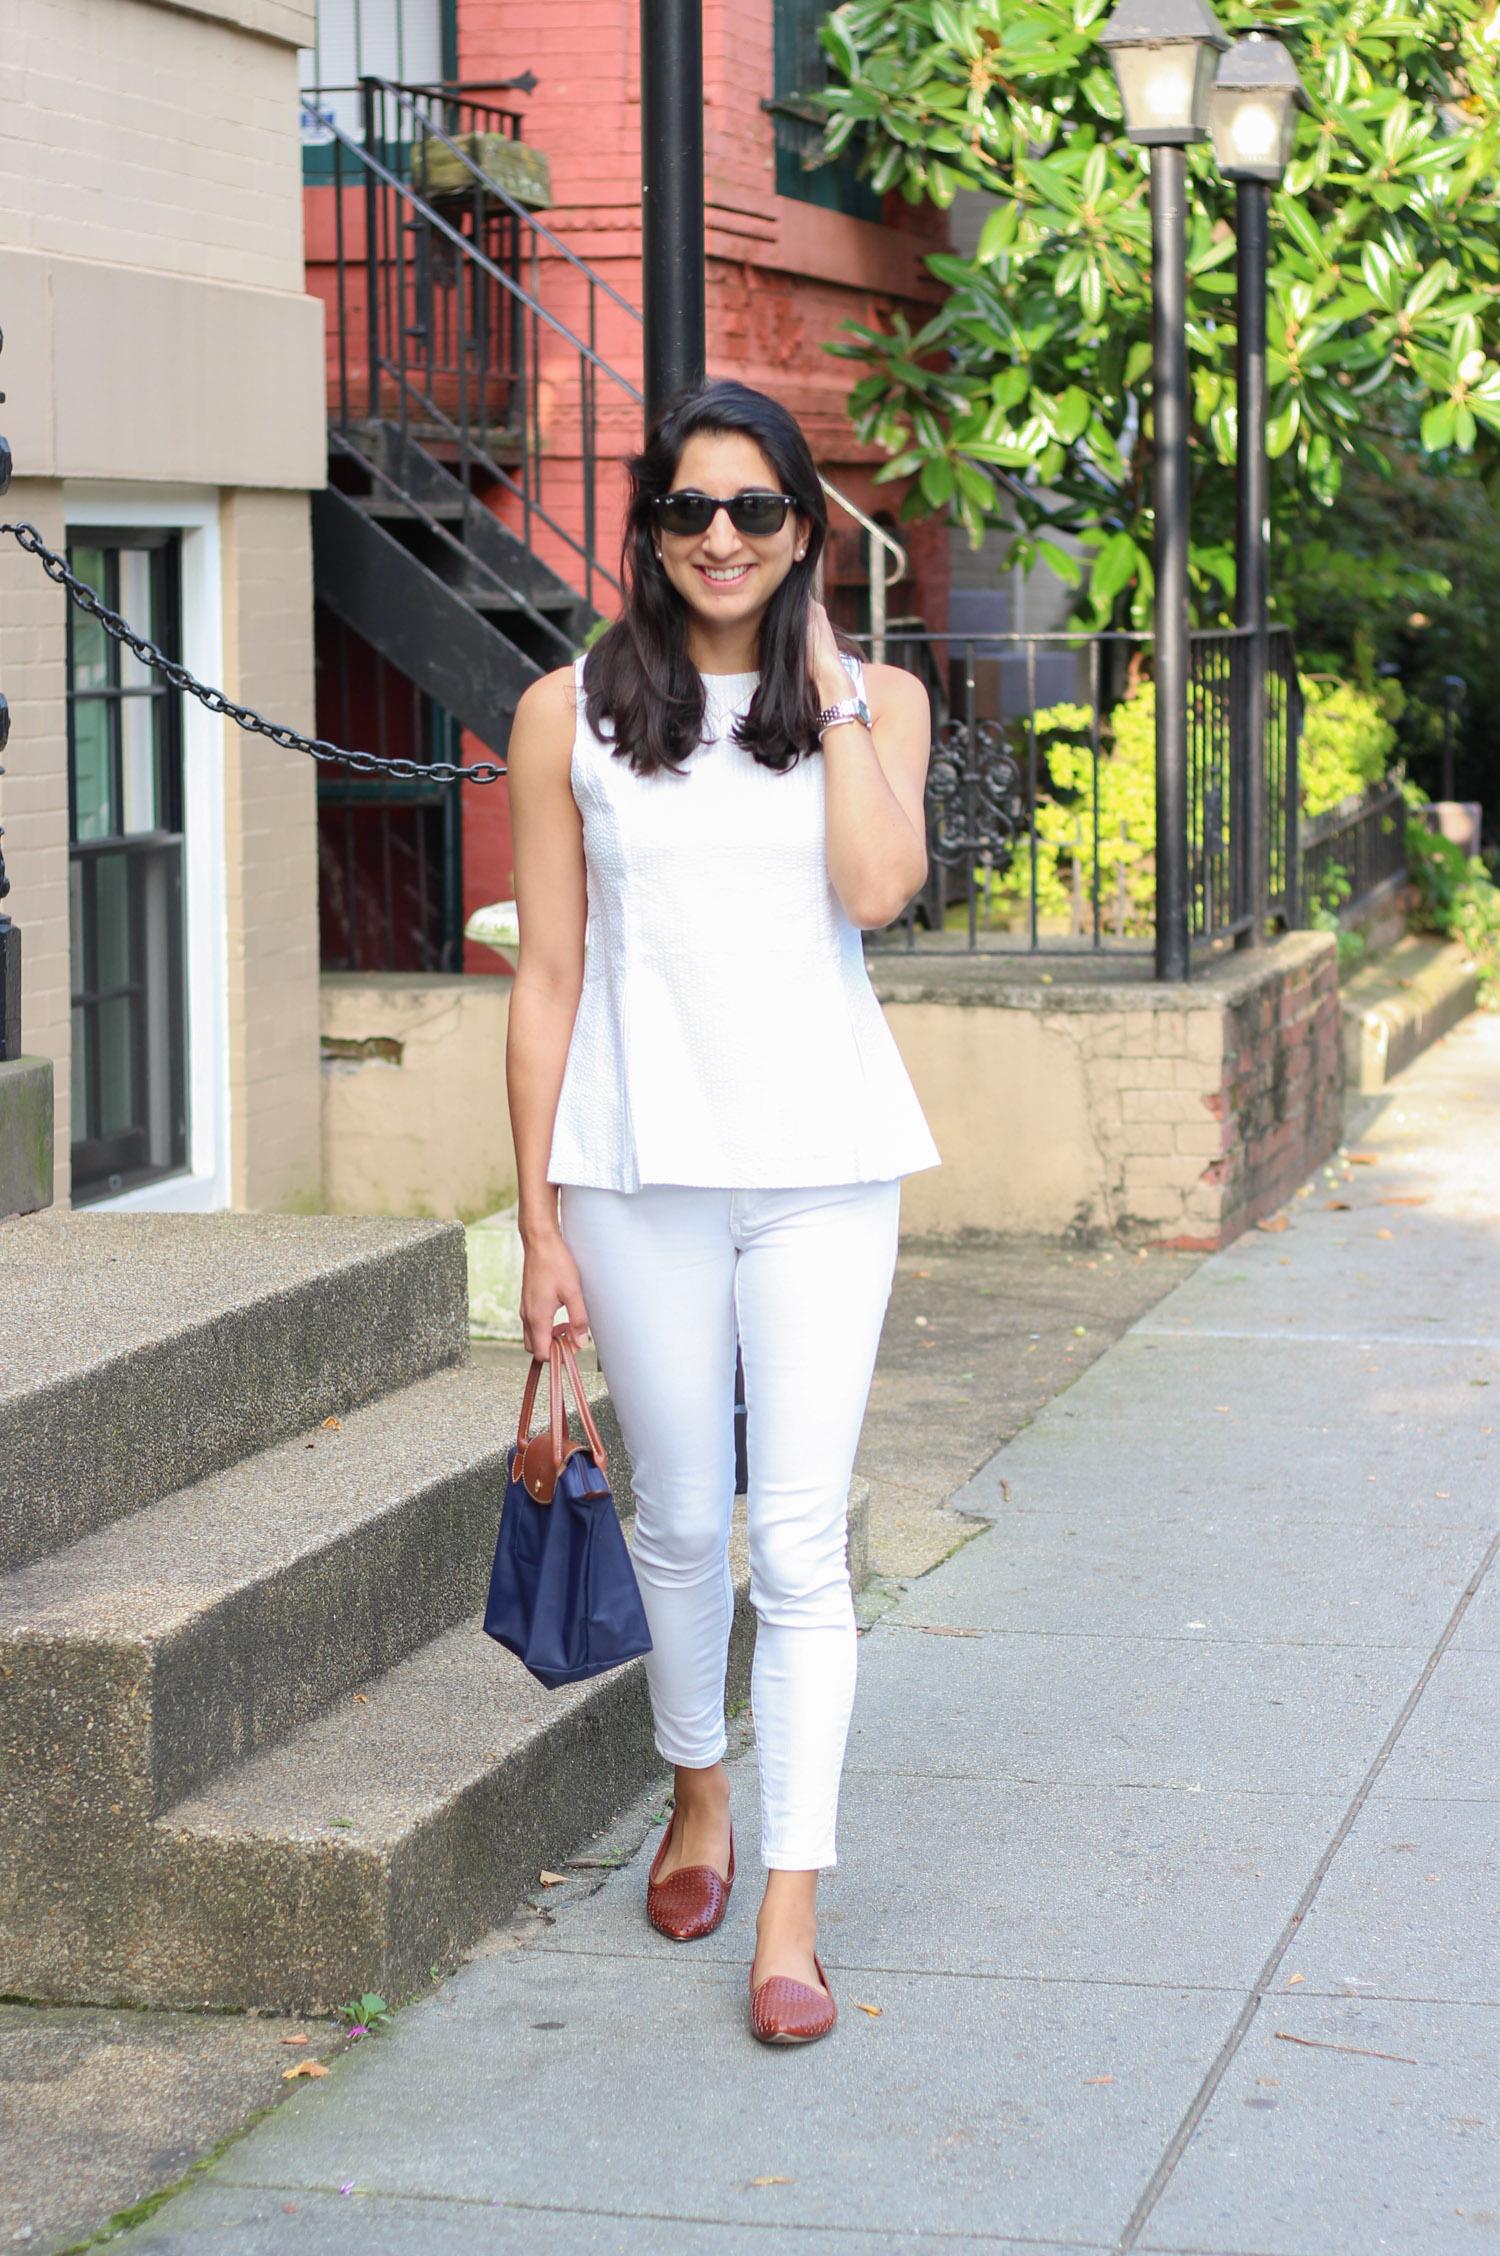 Duffield Lane white seersucker top featured by popular DC fashion blogger, Monica Dutia